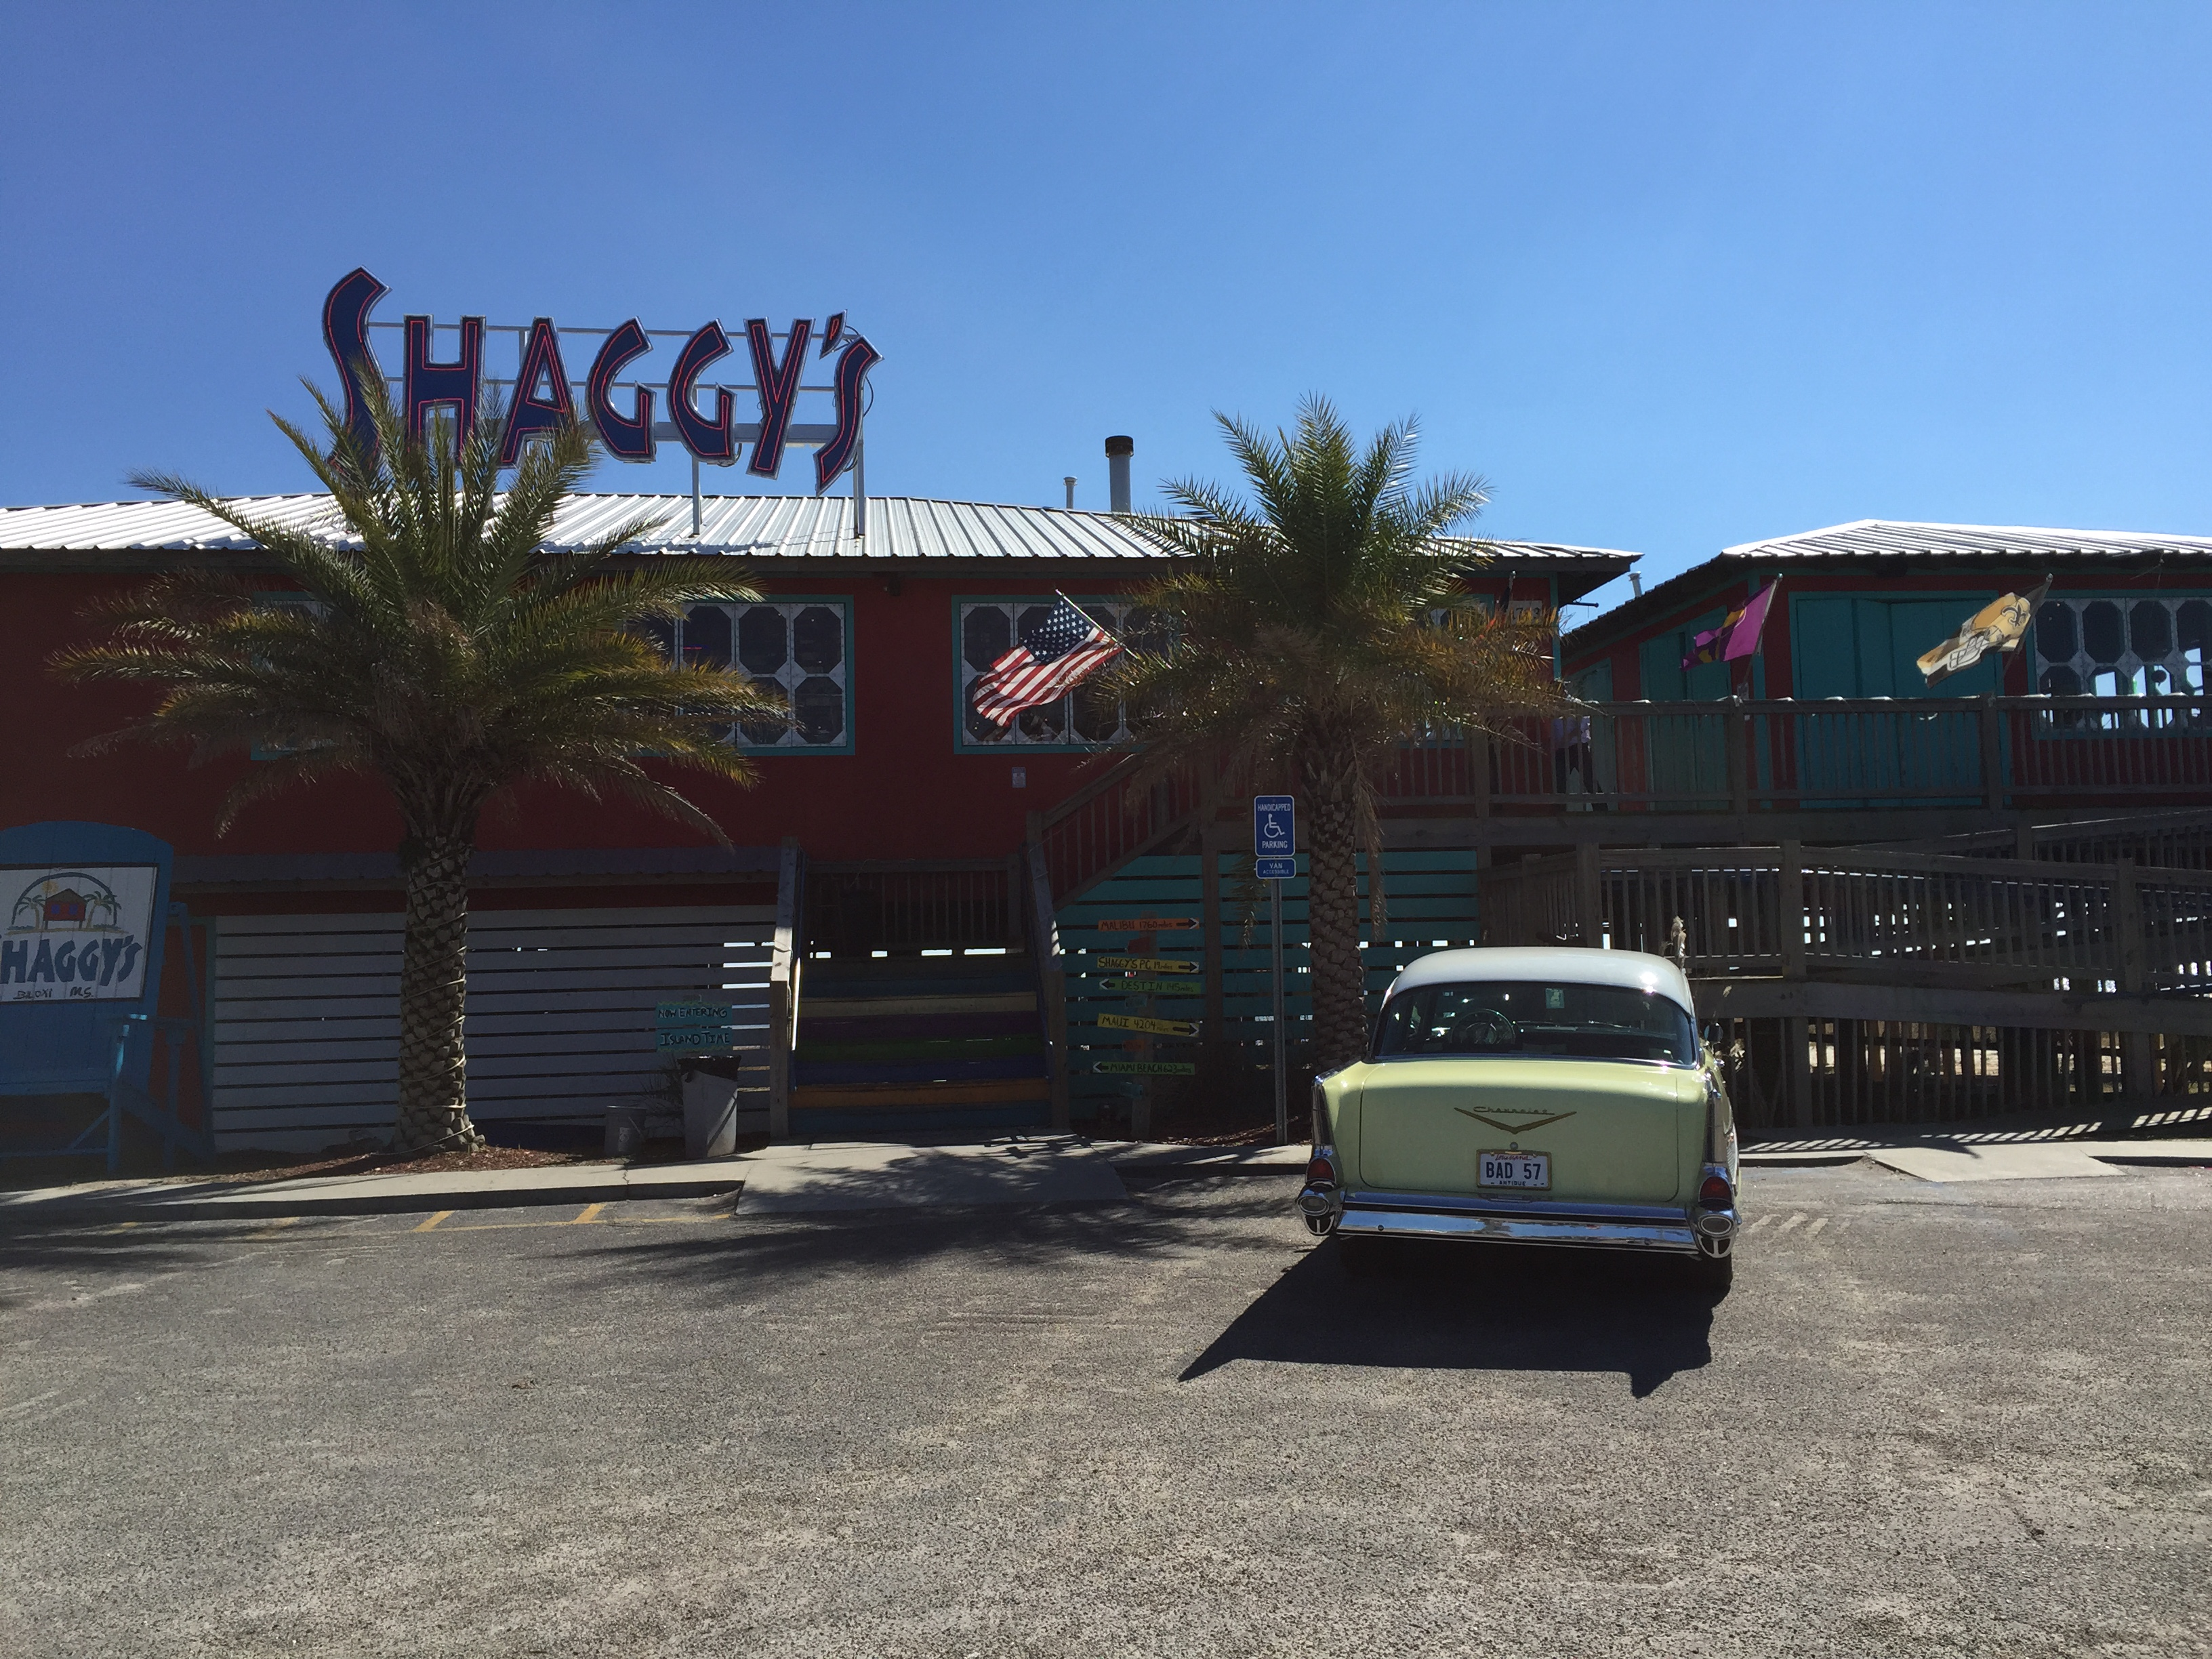 Shaggy's Biloxi Beach Bar And Grill, Biloxi MS